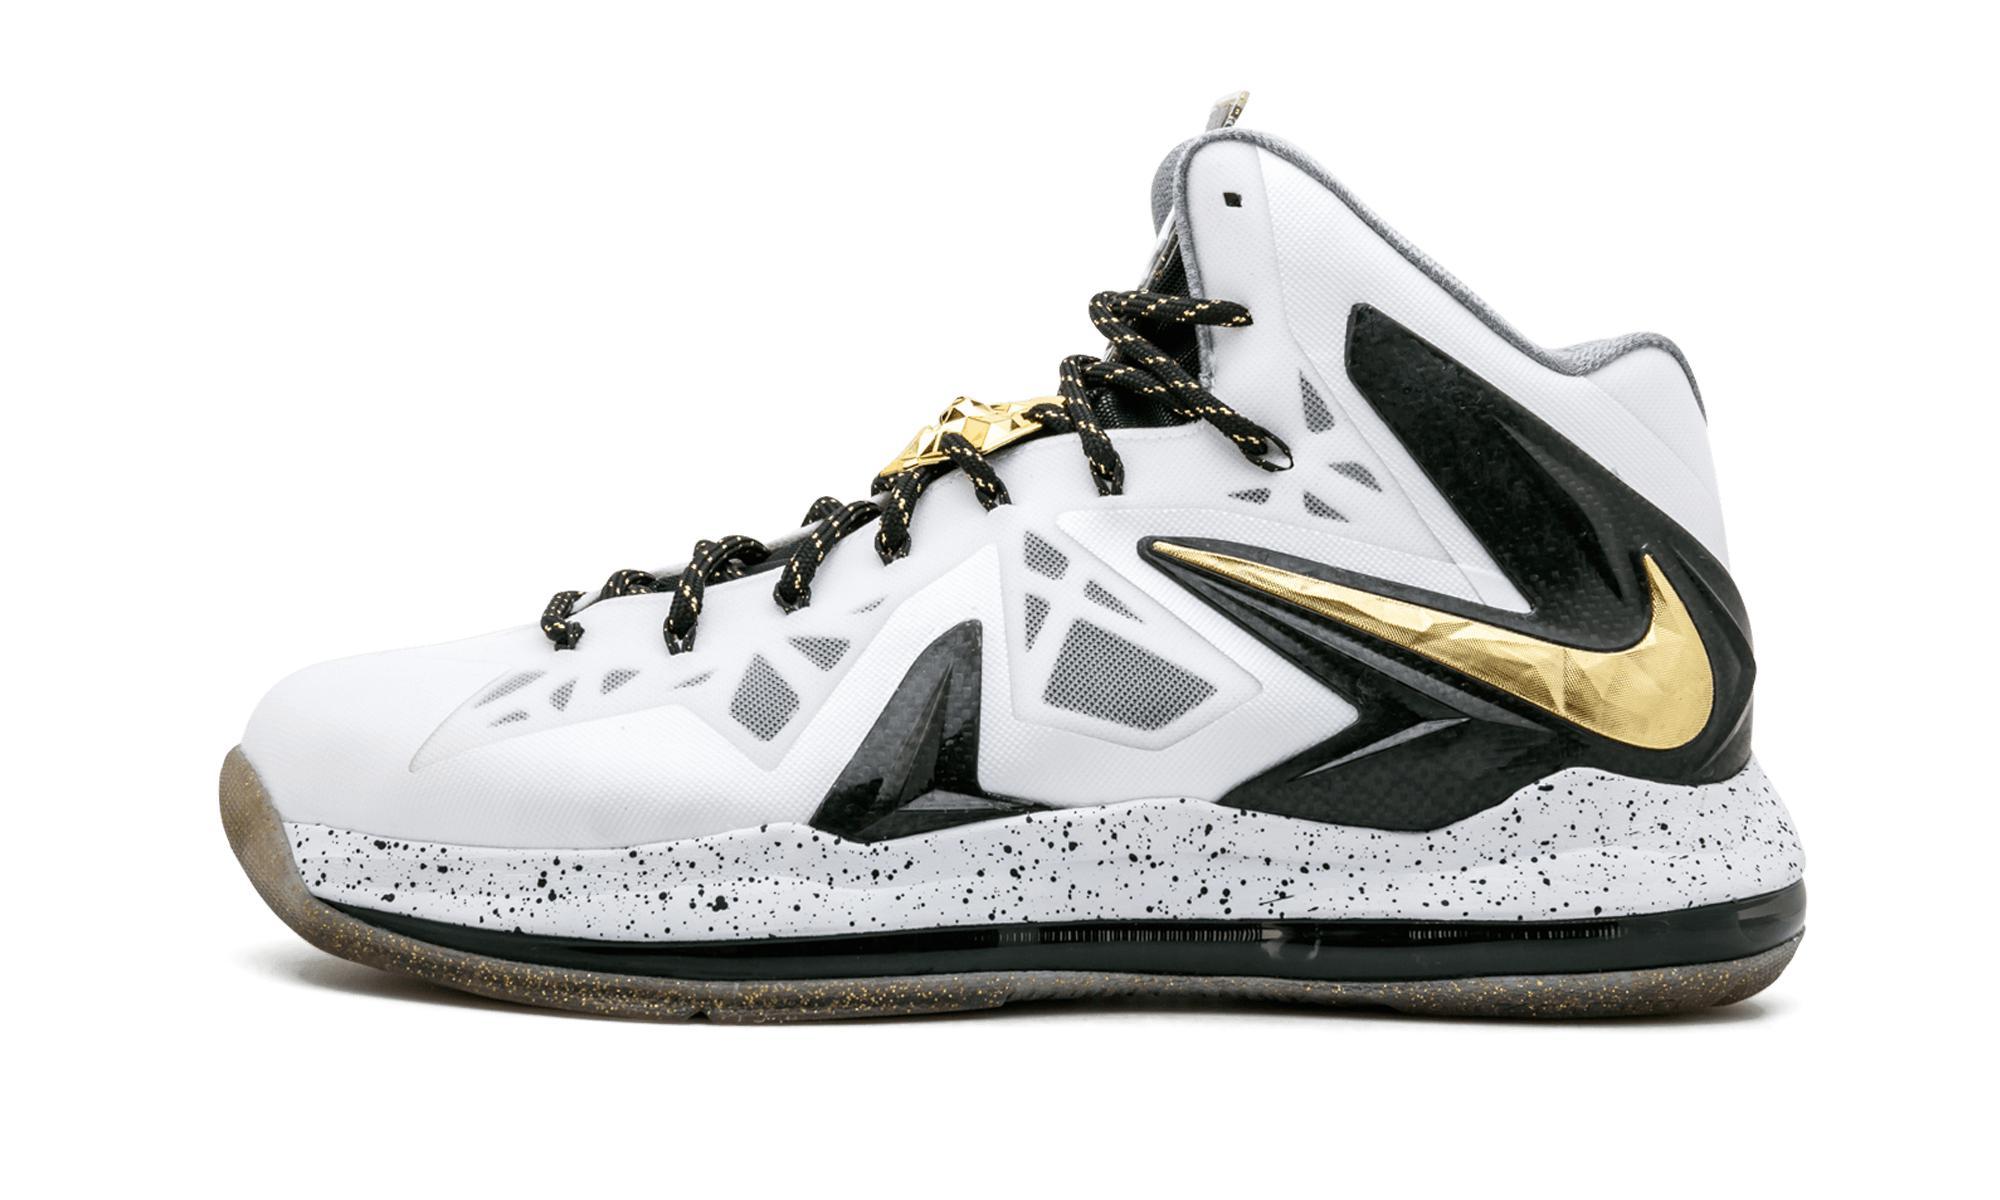 best sneakers 4d3d5 0ae26 Lyst - Nike Lebron 10 P.s Elite+ for Men